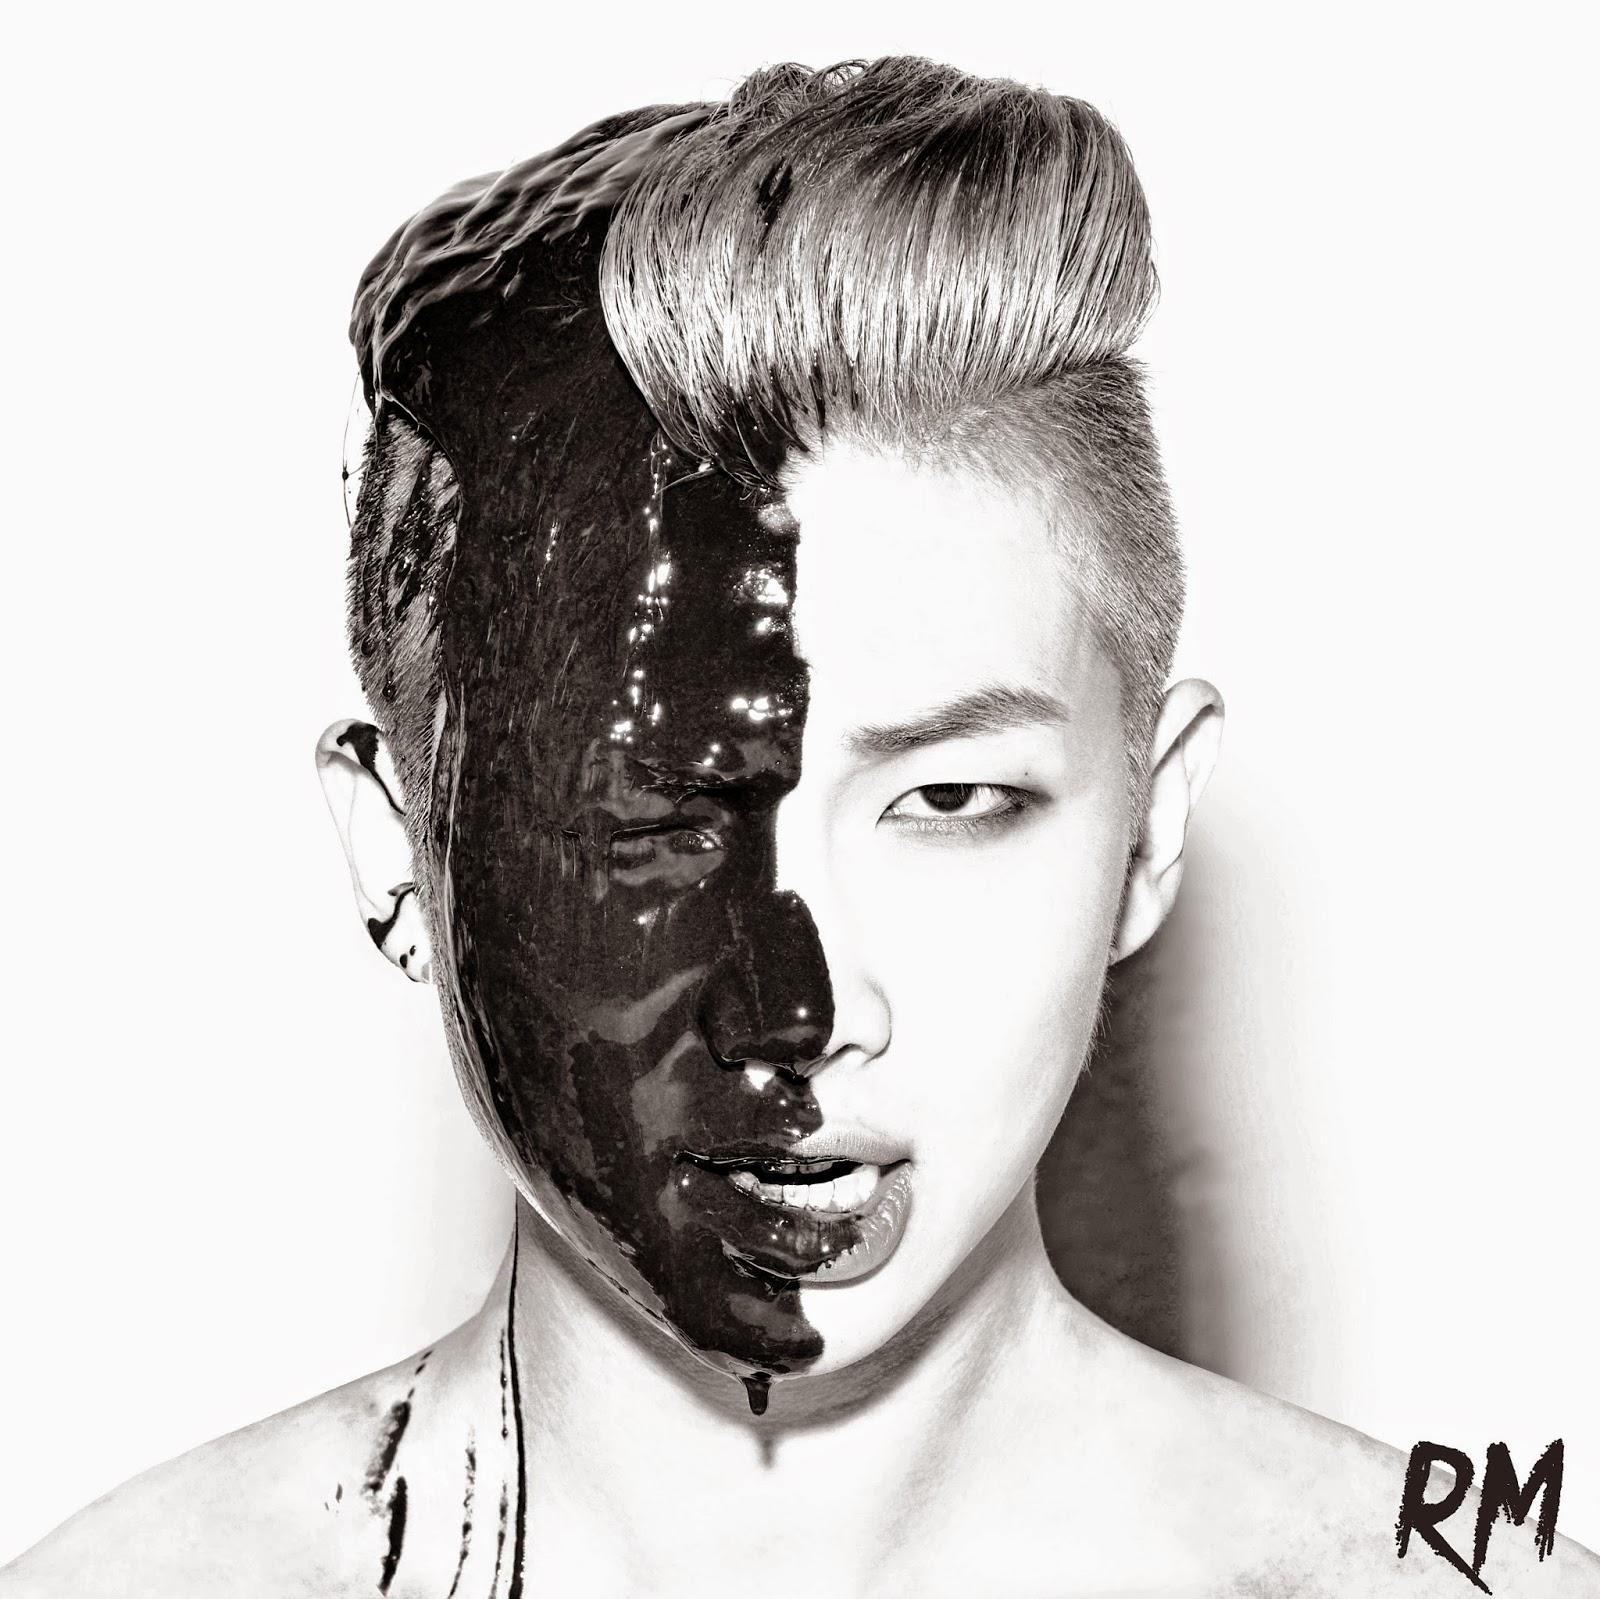 Rm Do You